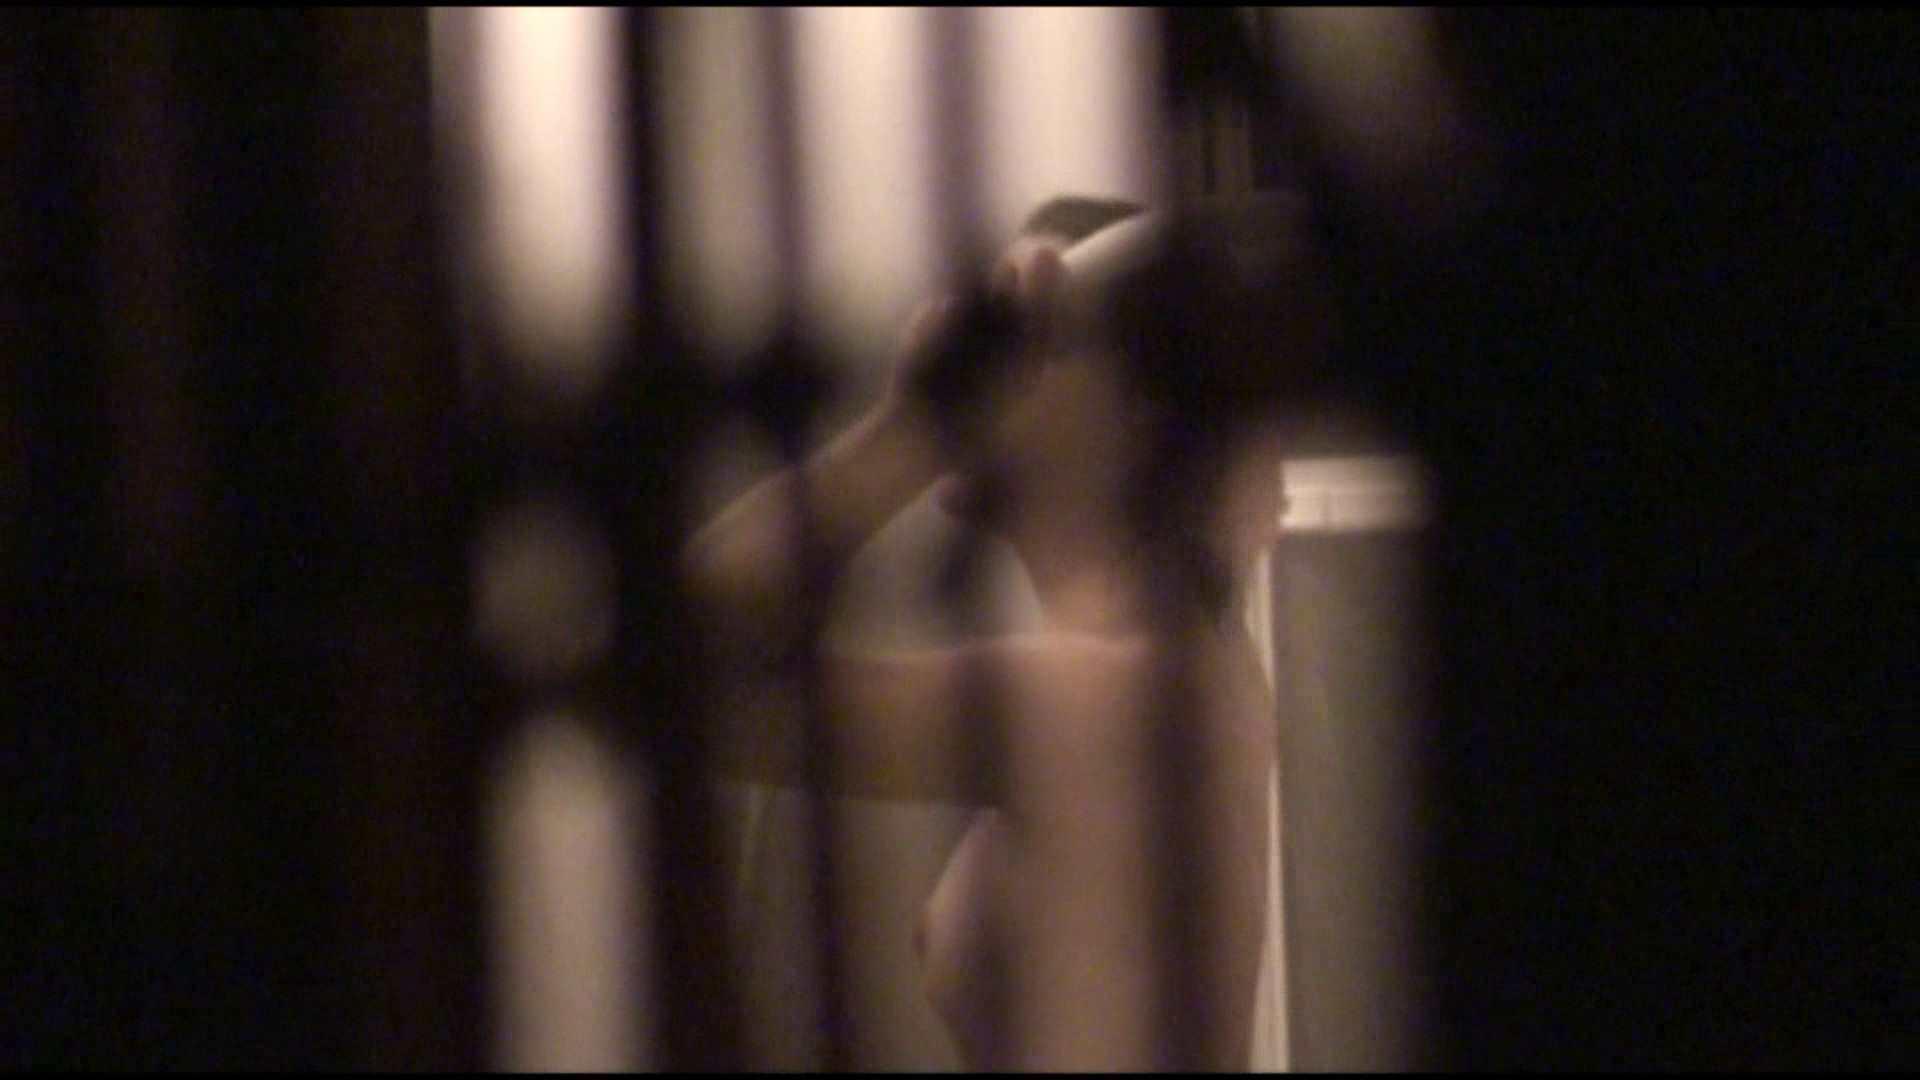 vol.05最高の極上美人!可愛い彼女の裸体をどうぞ!風呂上り鏡チェックも必見! 美人  68pic 56